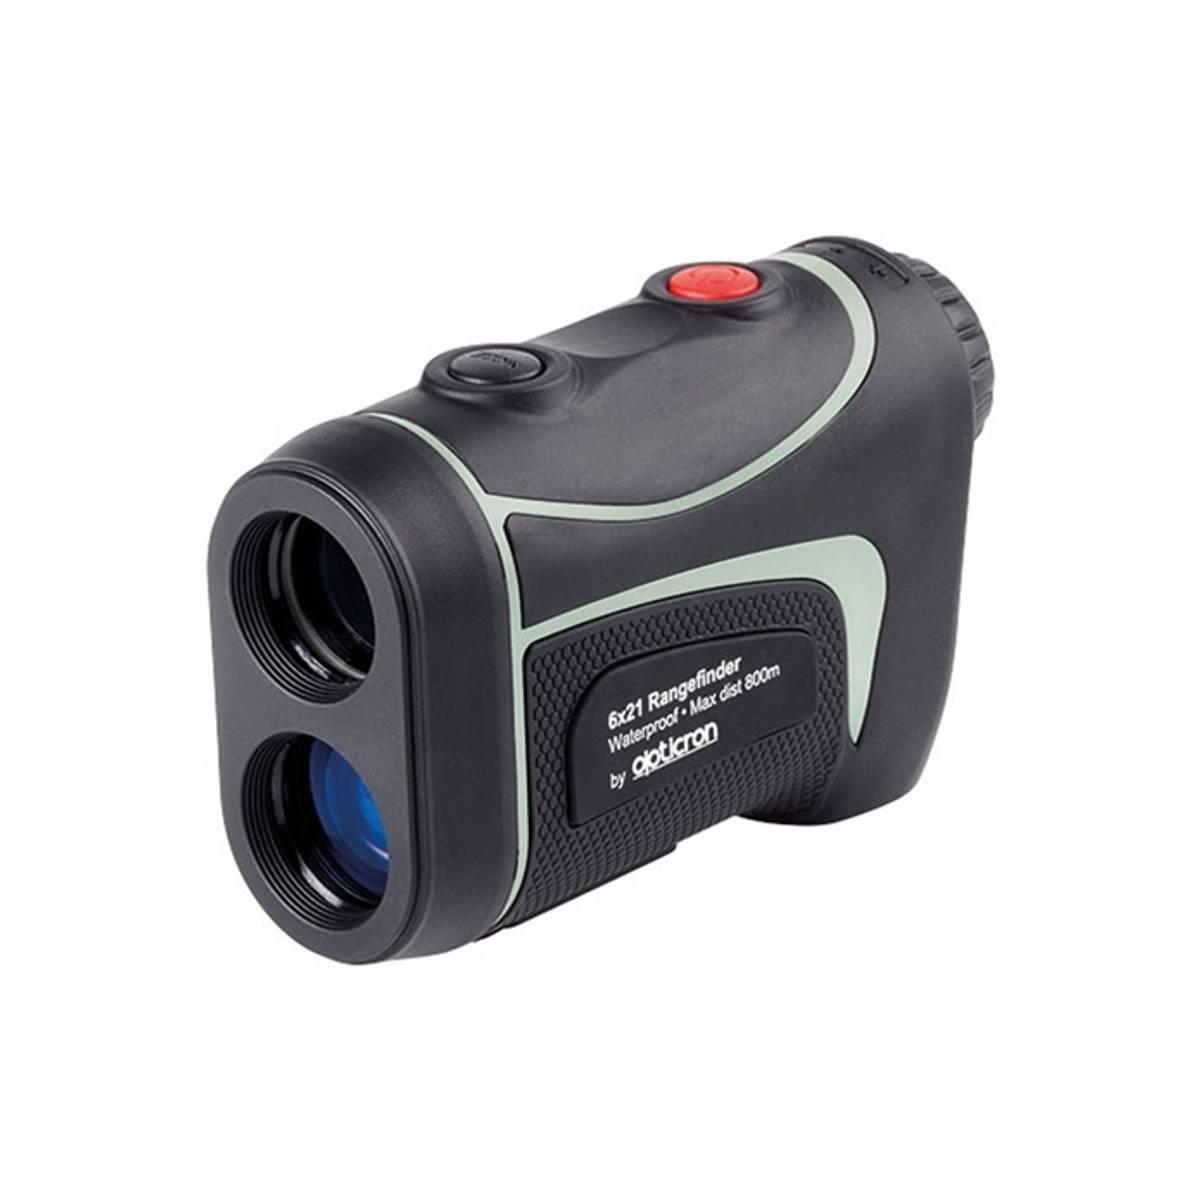 Opticron Ranger 800 laseravstandsmåler